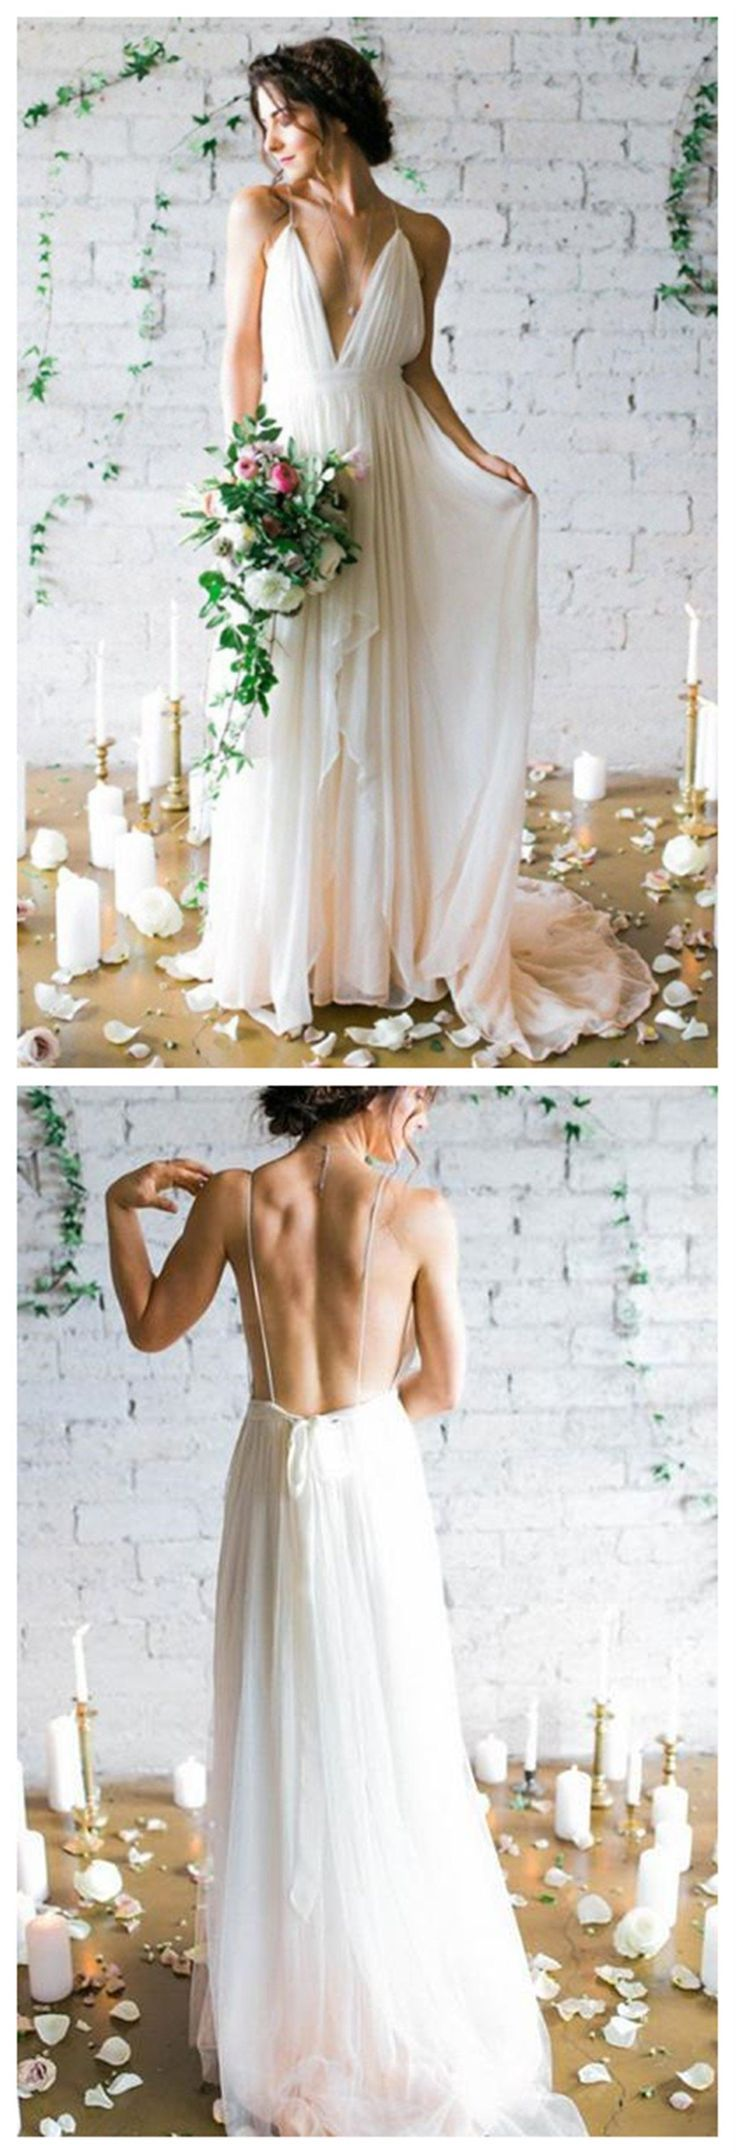 Simple Backless Beach Wedding Dresses Chiffon Long Custom Wedding Gowns Affordable Bridal Dresses 17098